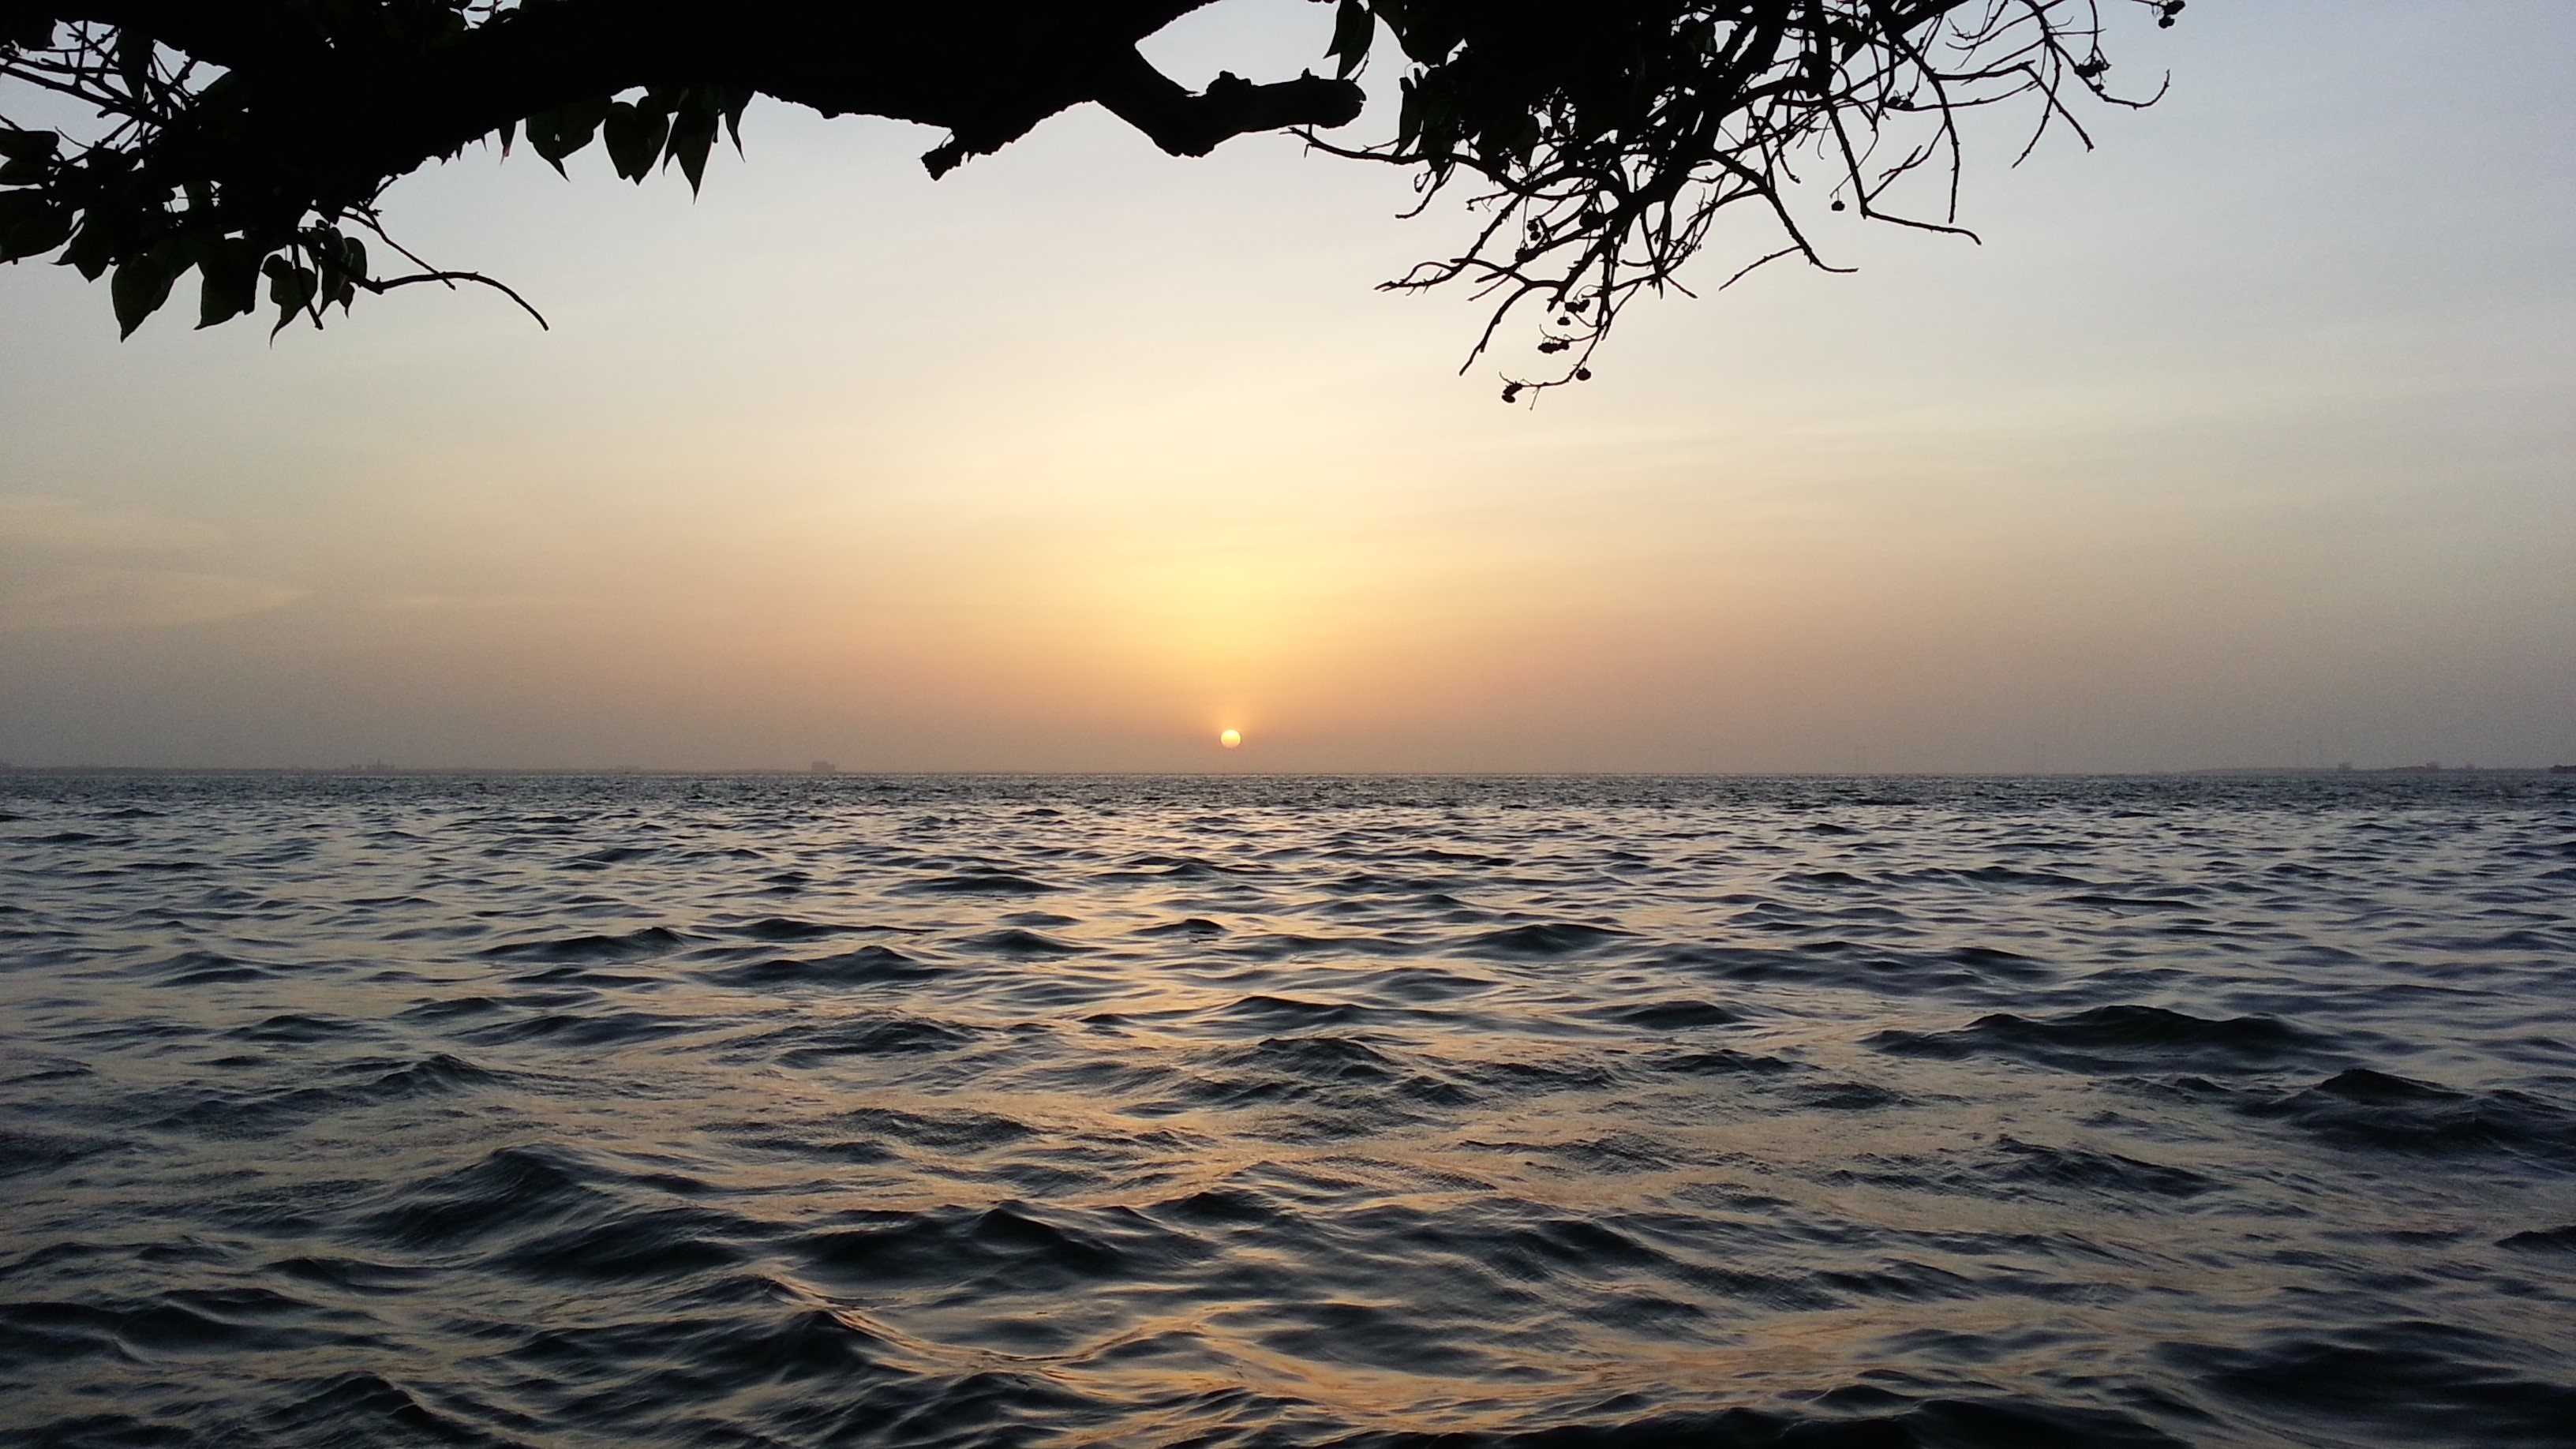 Wallpaper Lago de Maracaibo Images